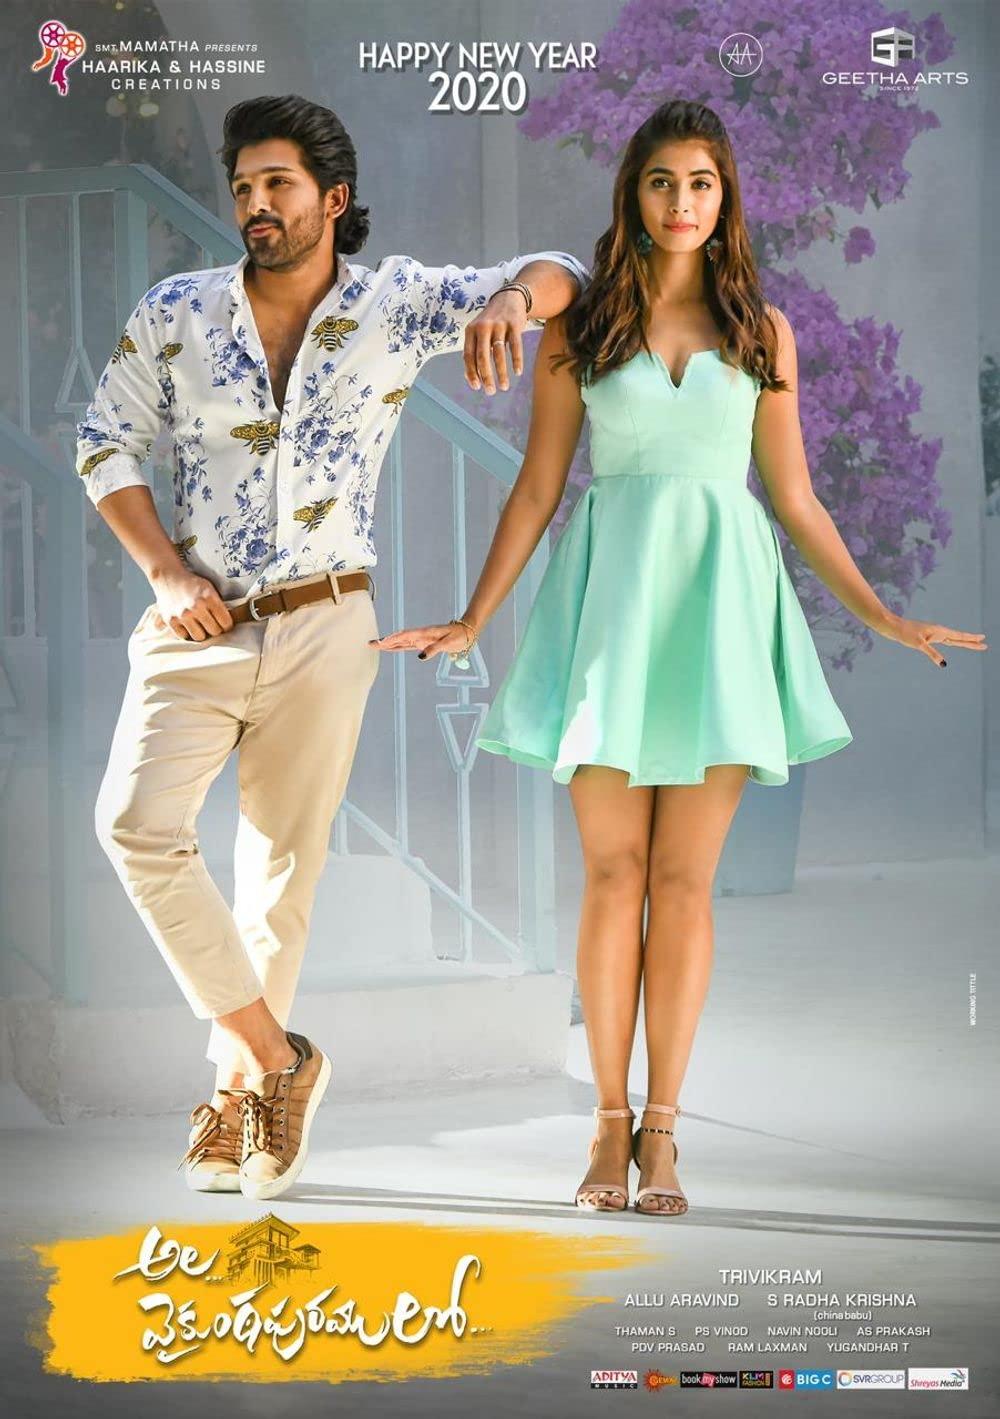 Ala Vaikunthapurramuloo (2021) Hindi Dubbed Full Movie 480p, 720p, 1080p Download & Watch Online